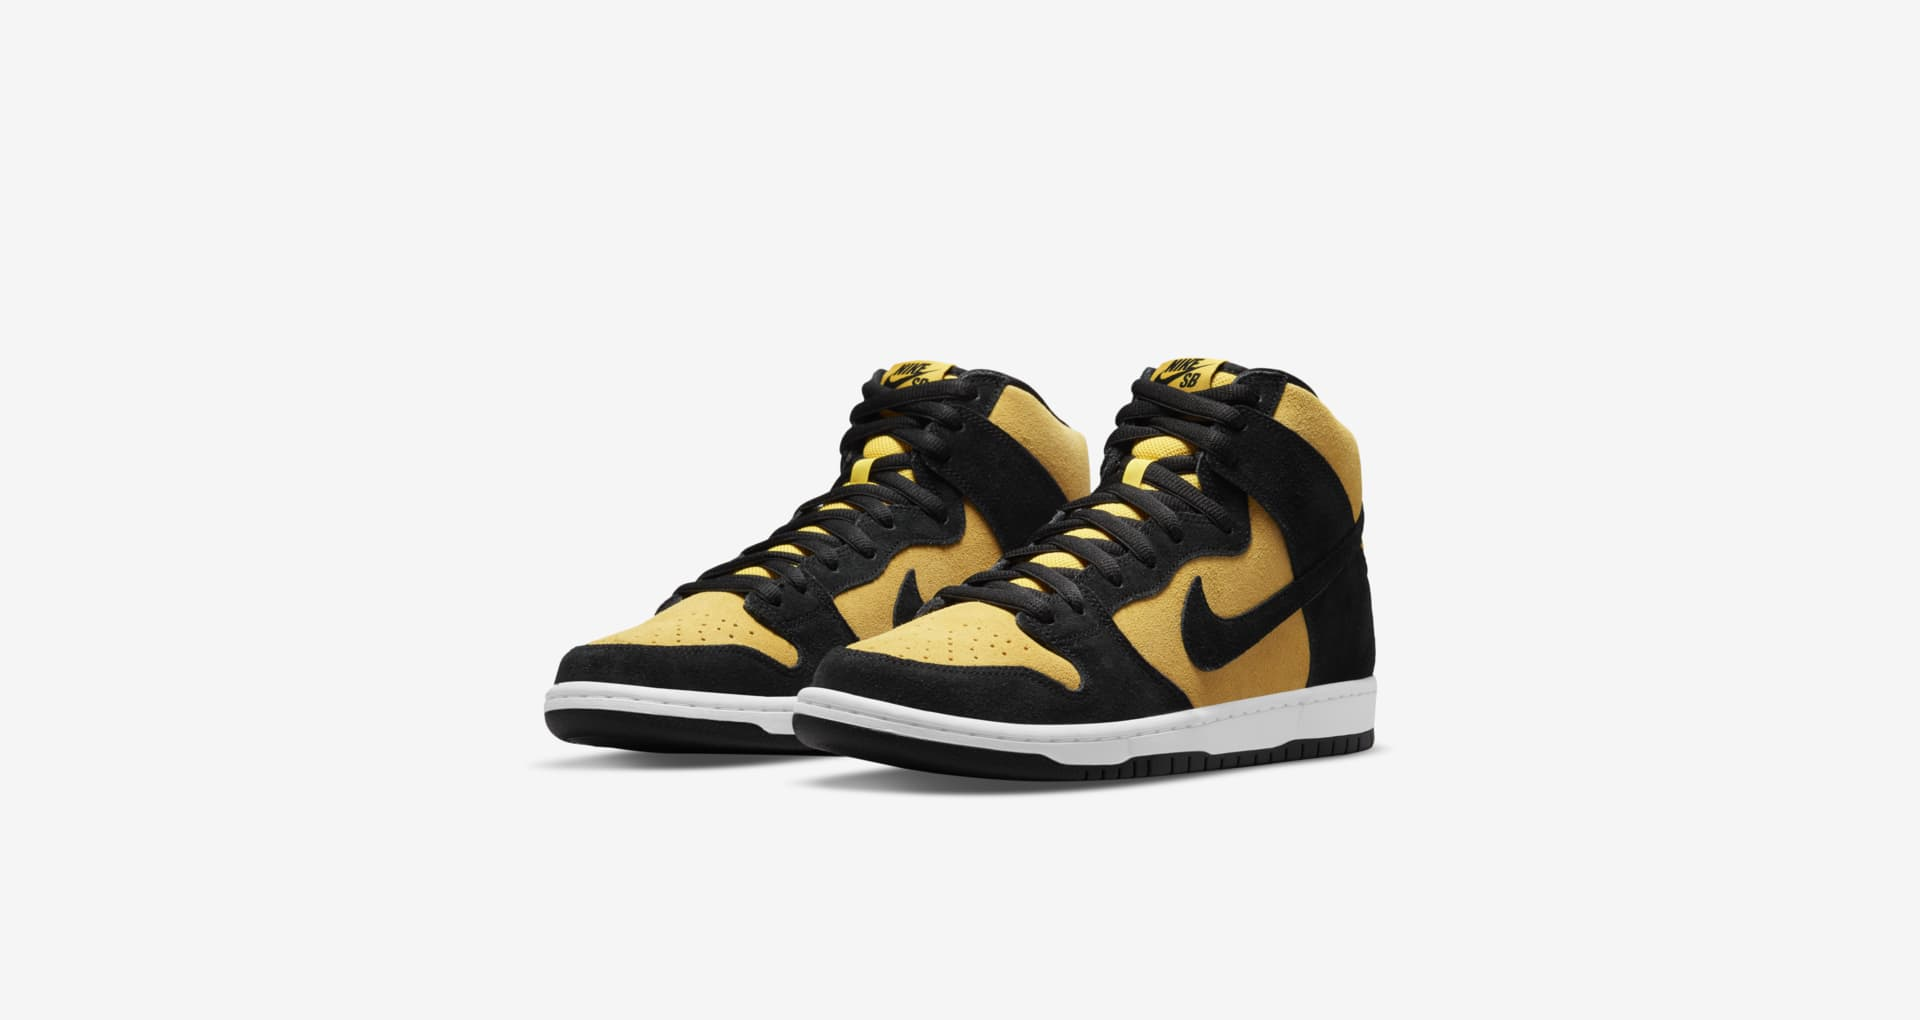 Dunk SB,Nike,发售  SNKRS 刚刚上架!反转武当 Dunk SB 质感不俗!下周发售!